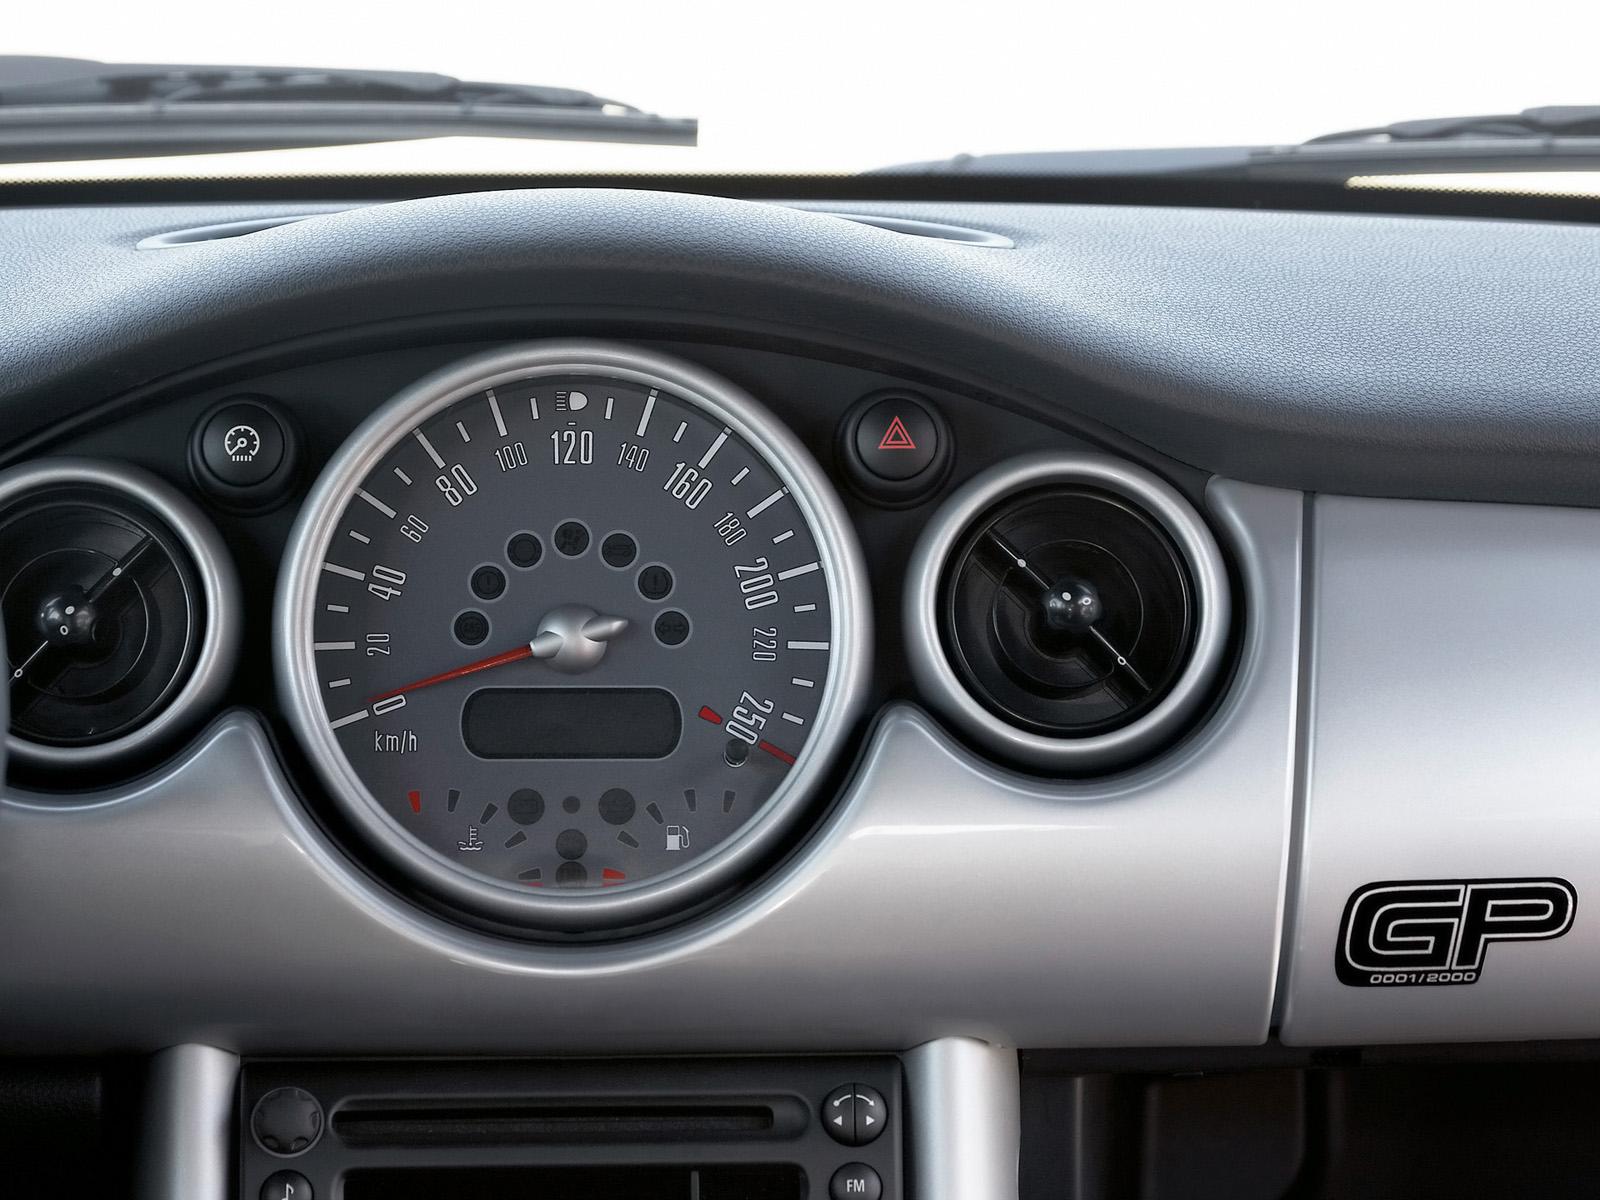 2006-MINI-Cooper-S-GP-Speedometer-1600x1200